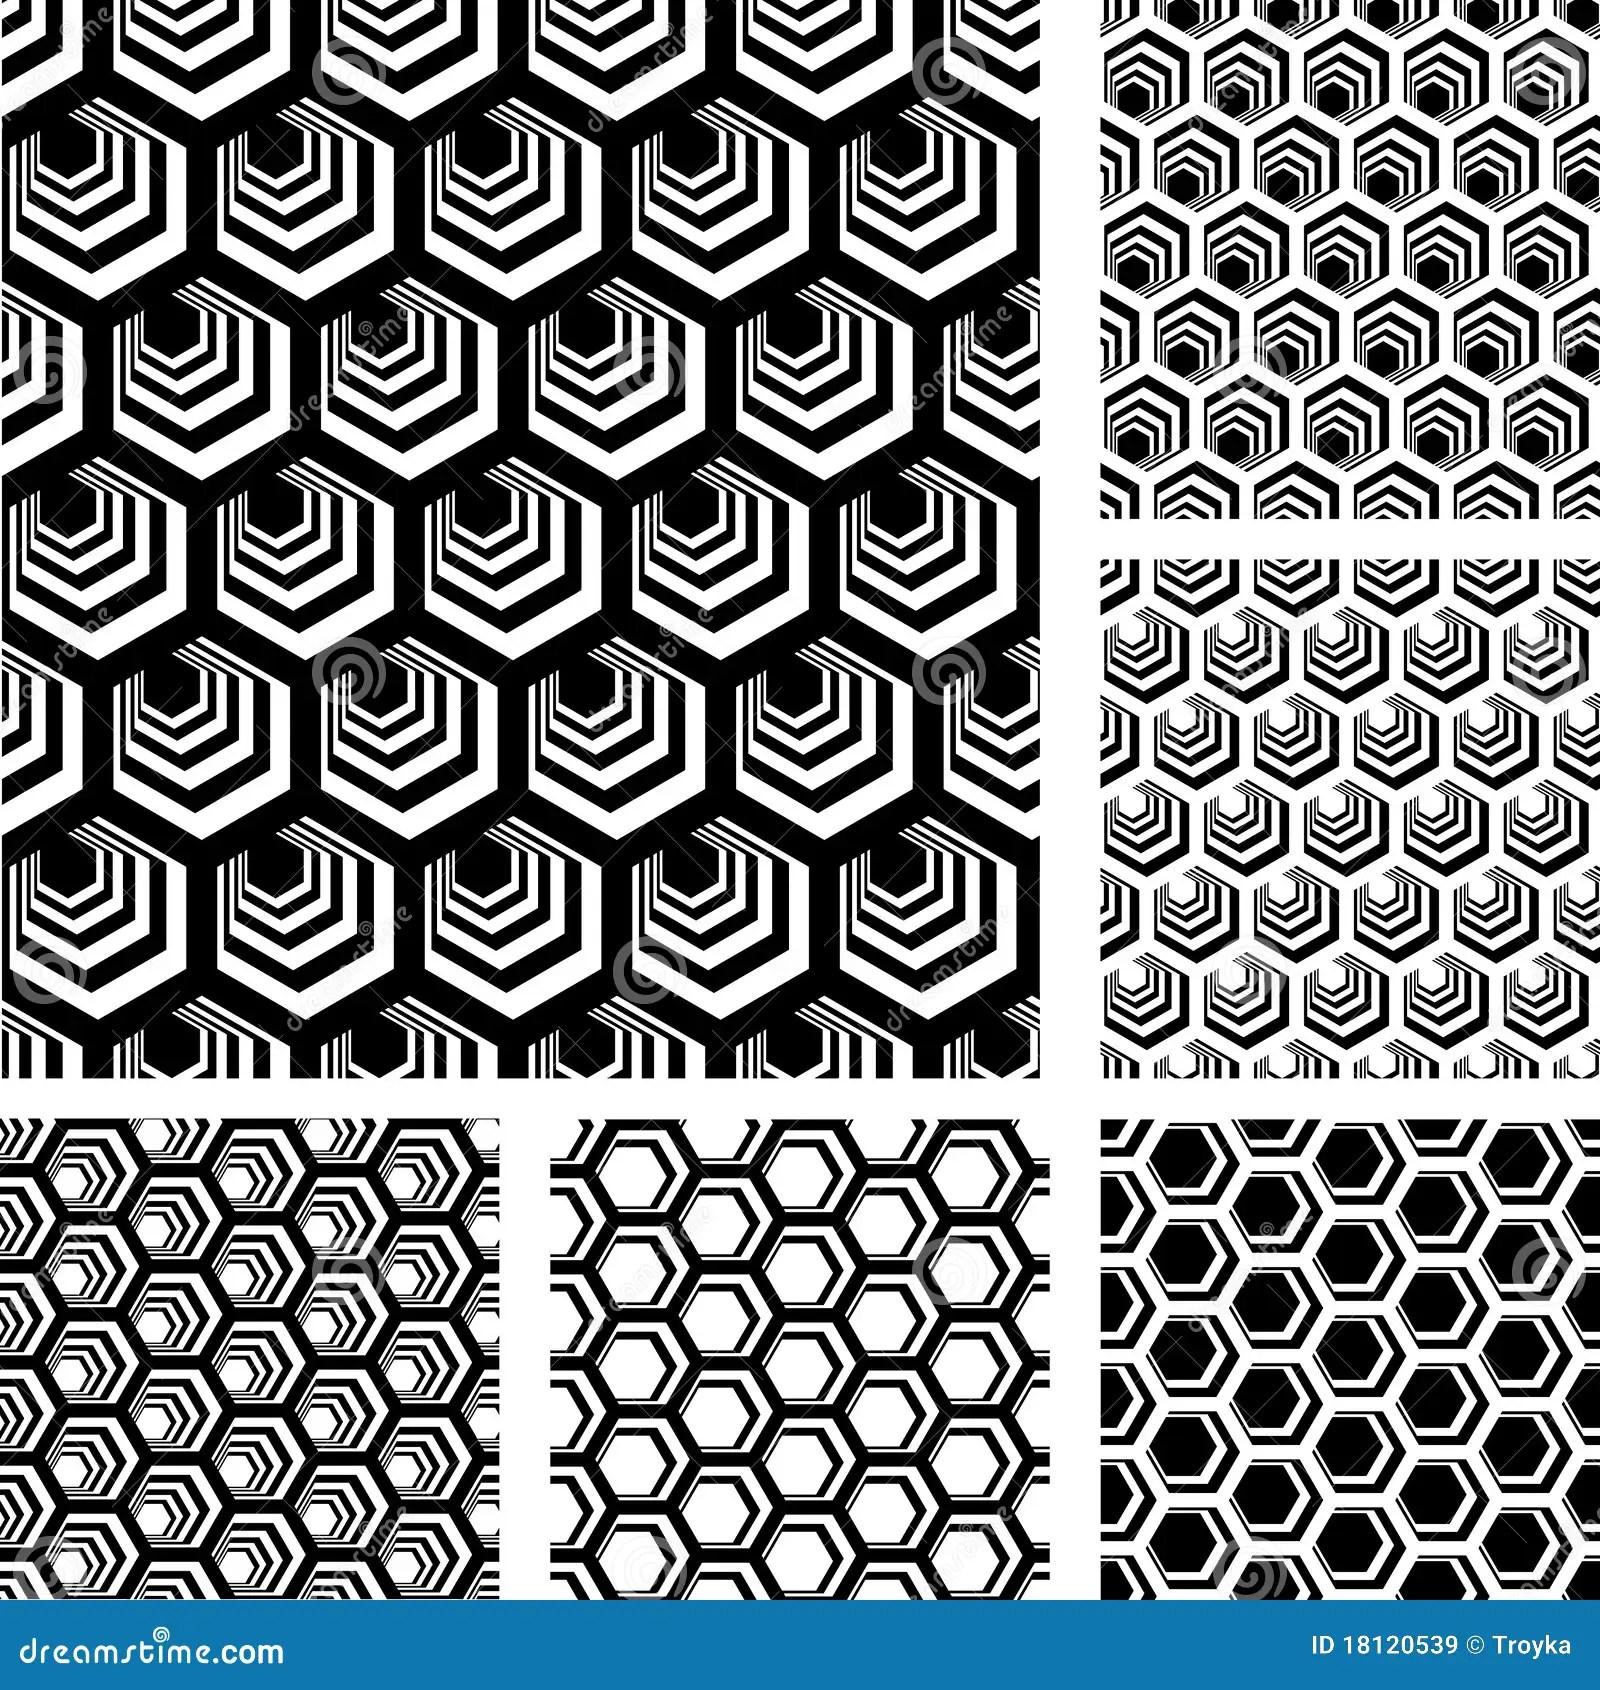 Seamless Geometric Patterns Set Royalty Free Stock Images